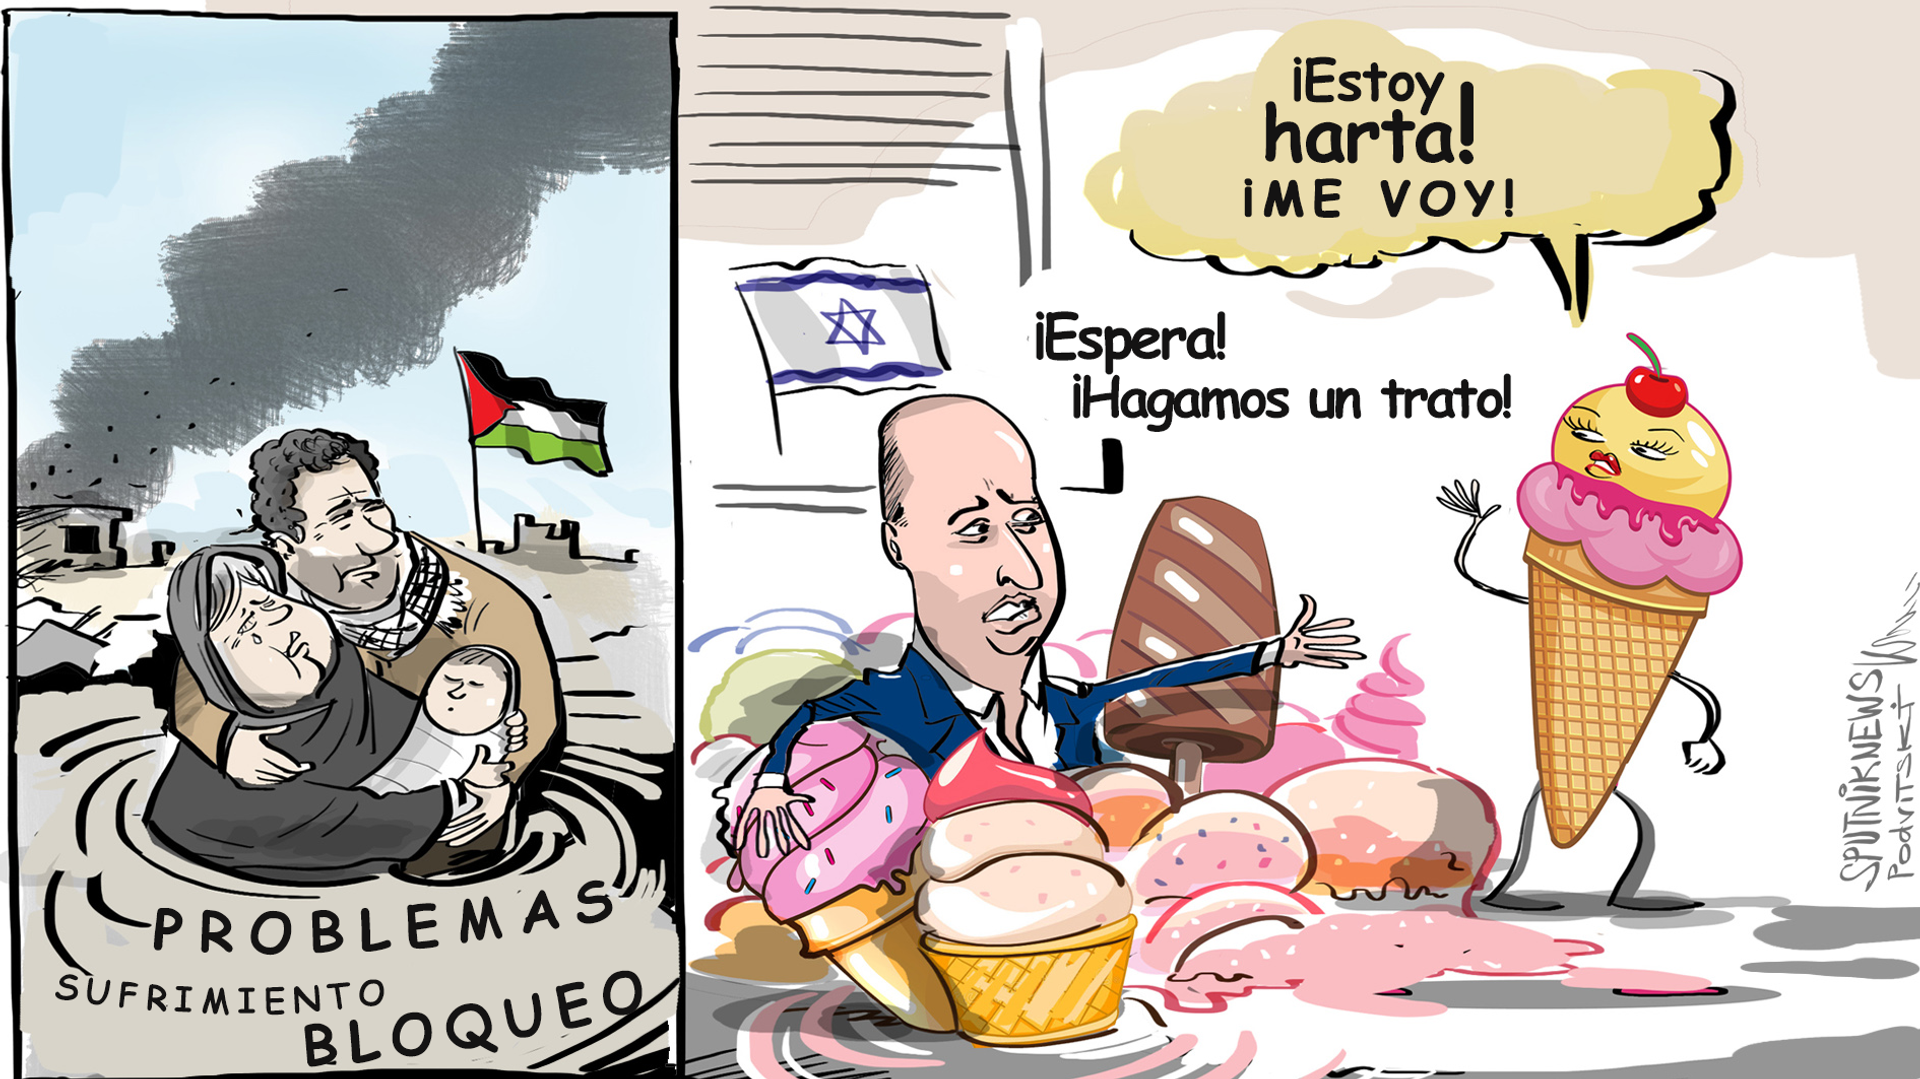 Israel vs. los helados Ben & Jerry's - Sputnik Mundo, 1920, 21.07.2021